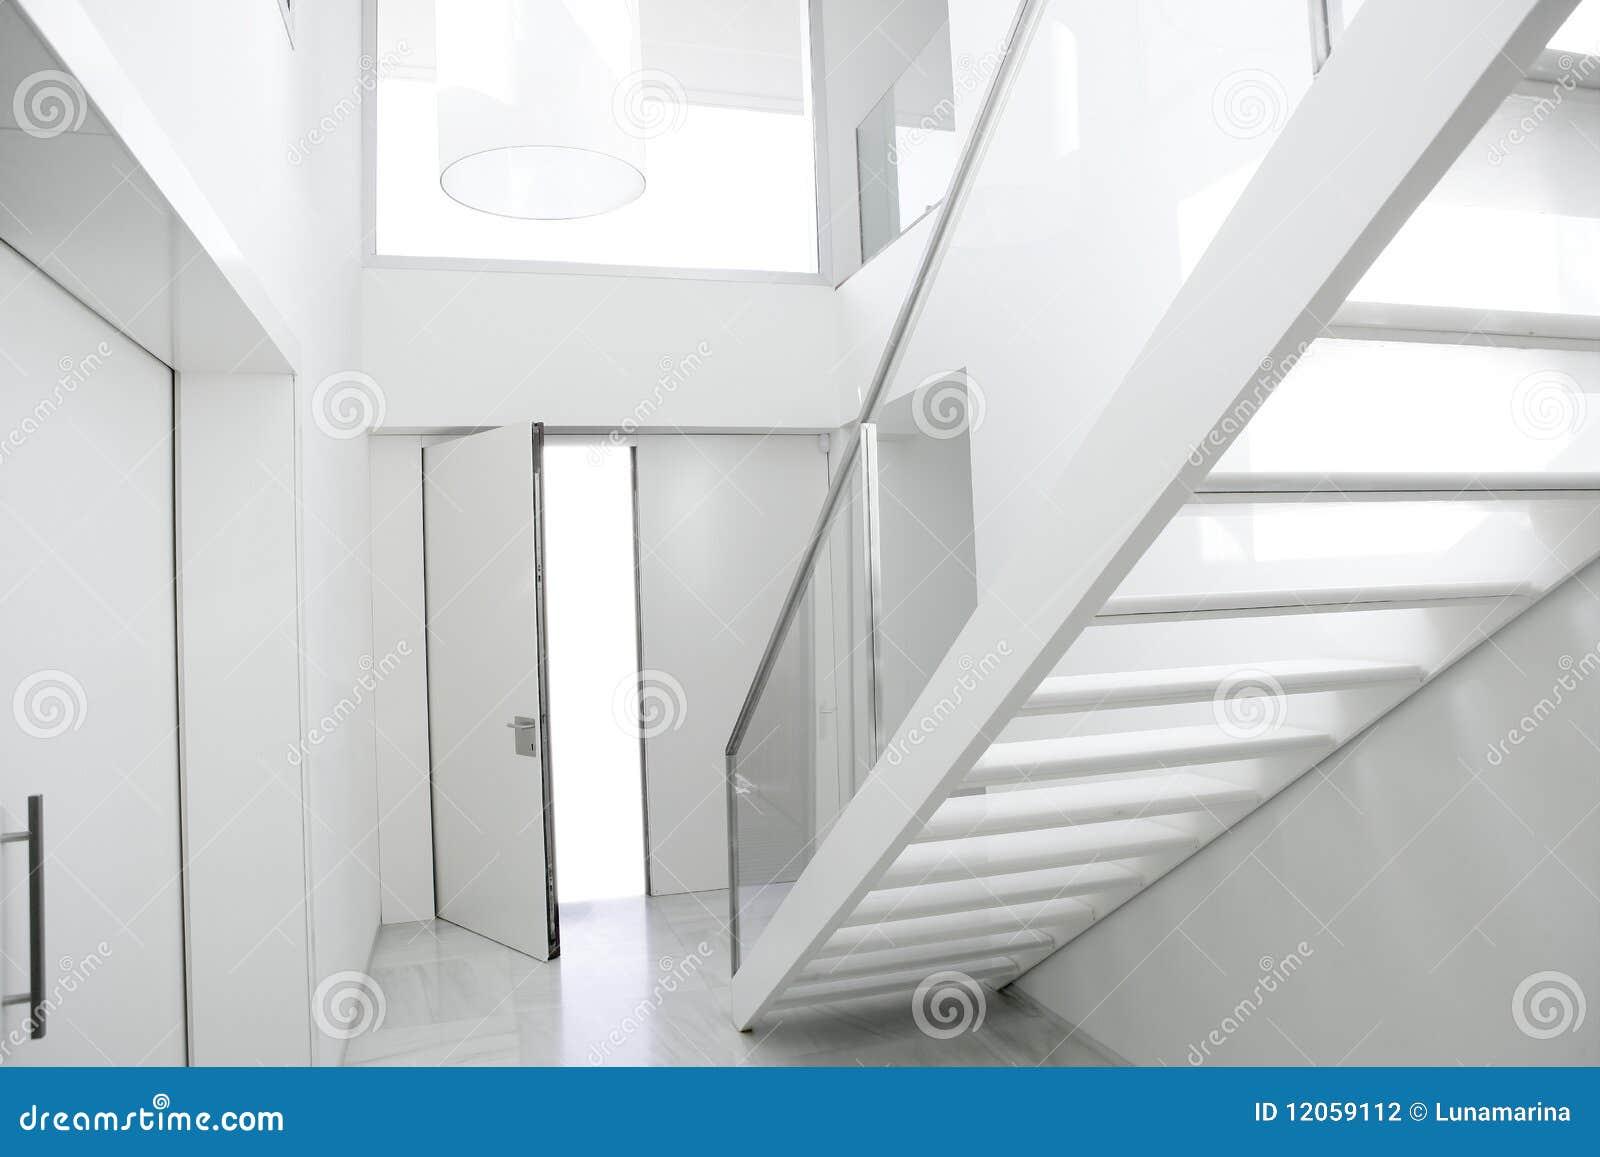 Deco hal binnenkomst huis maison design obas us